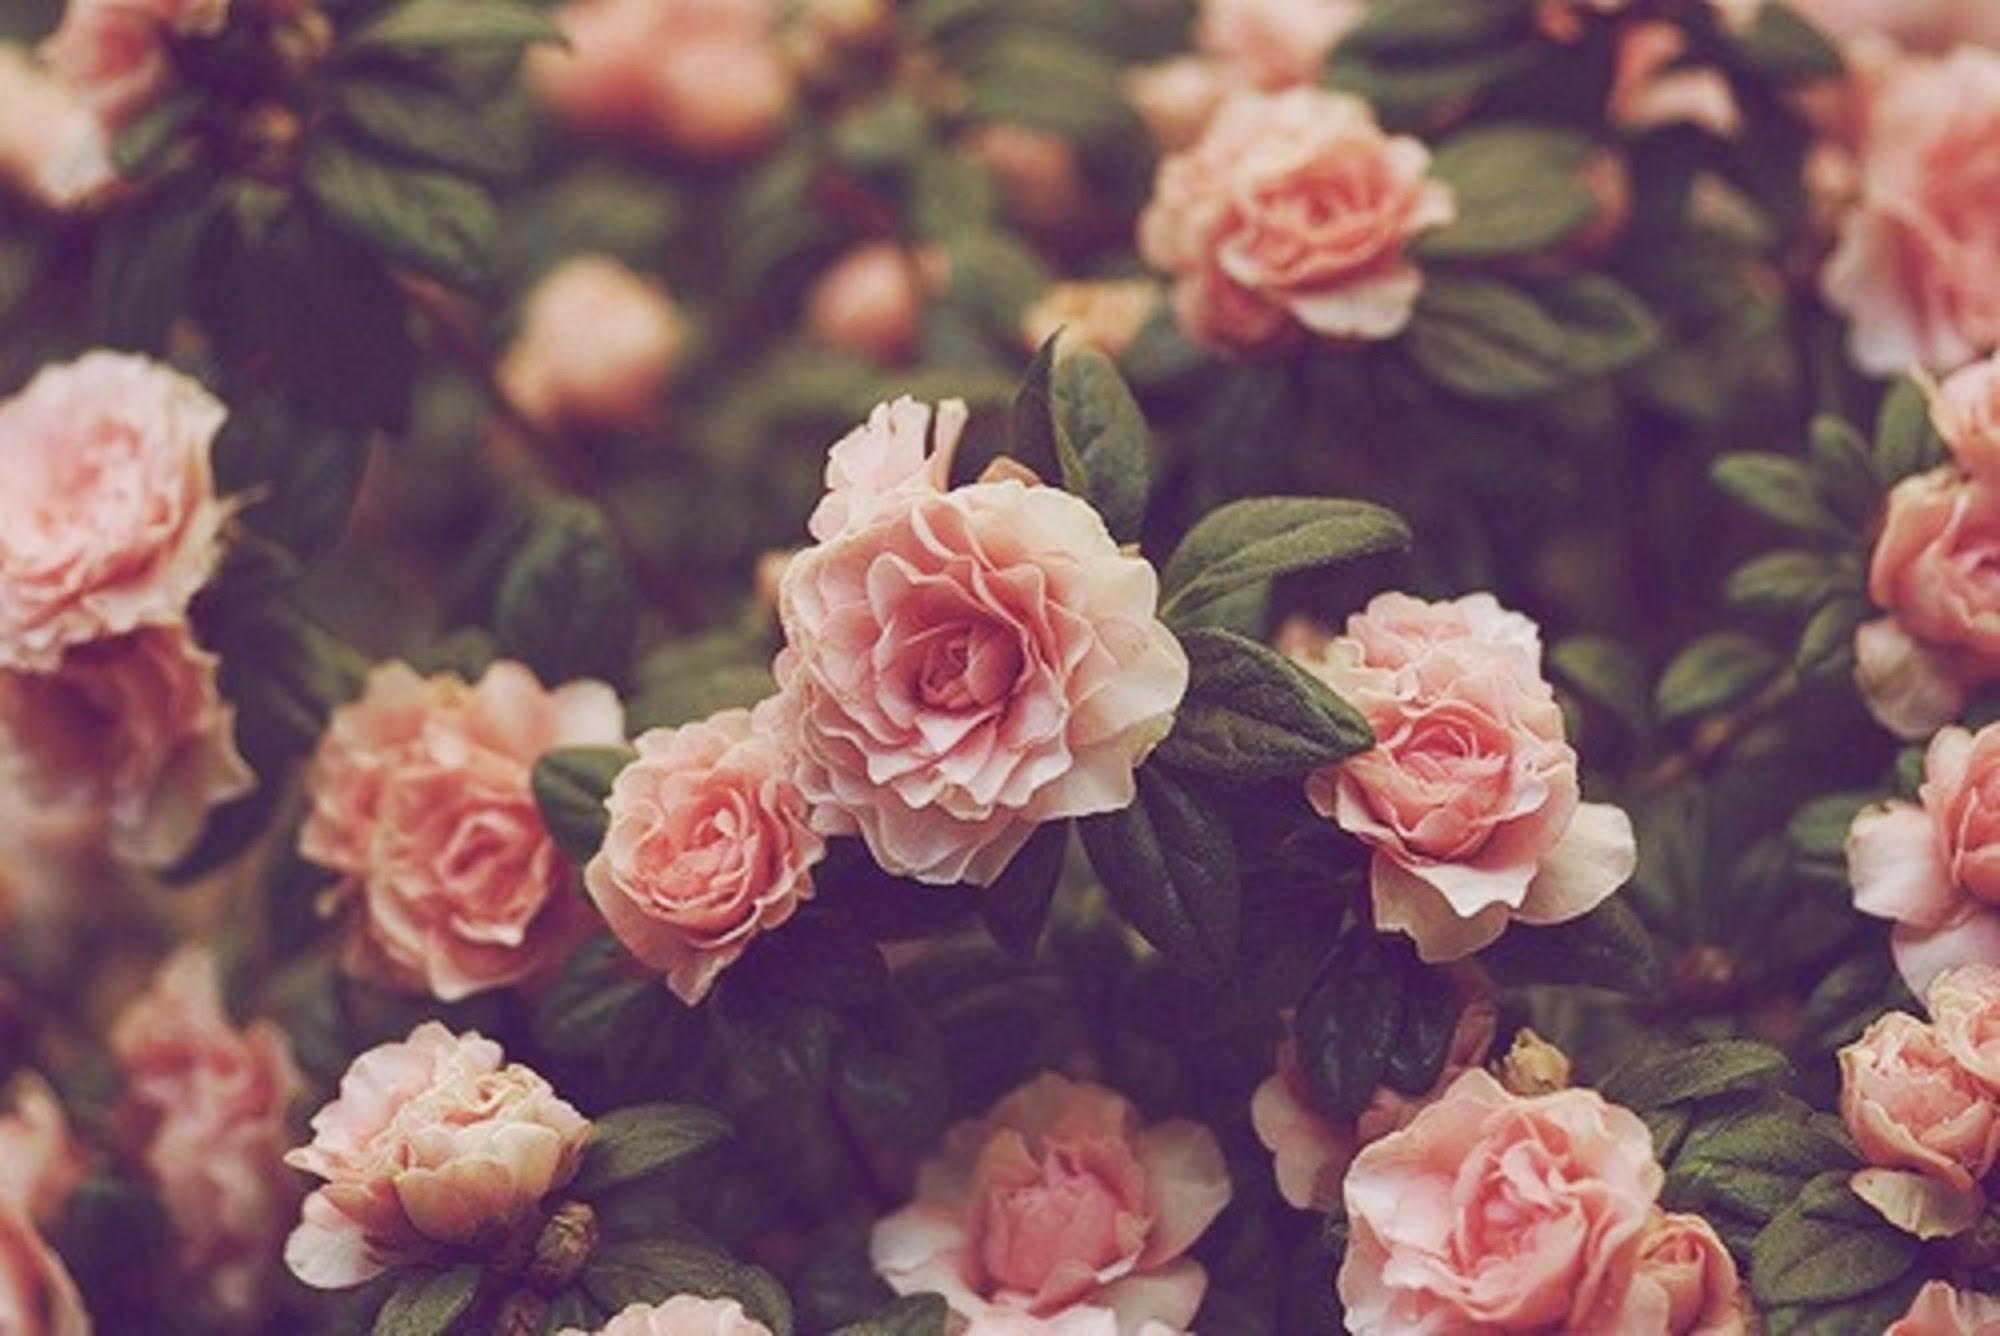 2000x1336 Vintage Flower Picture